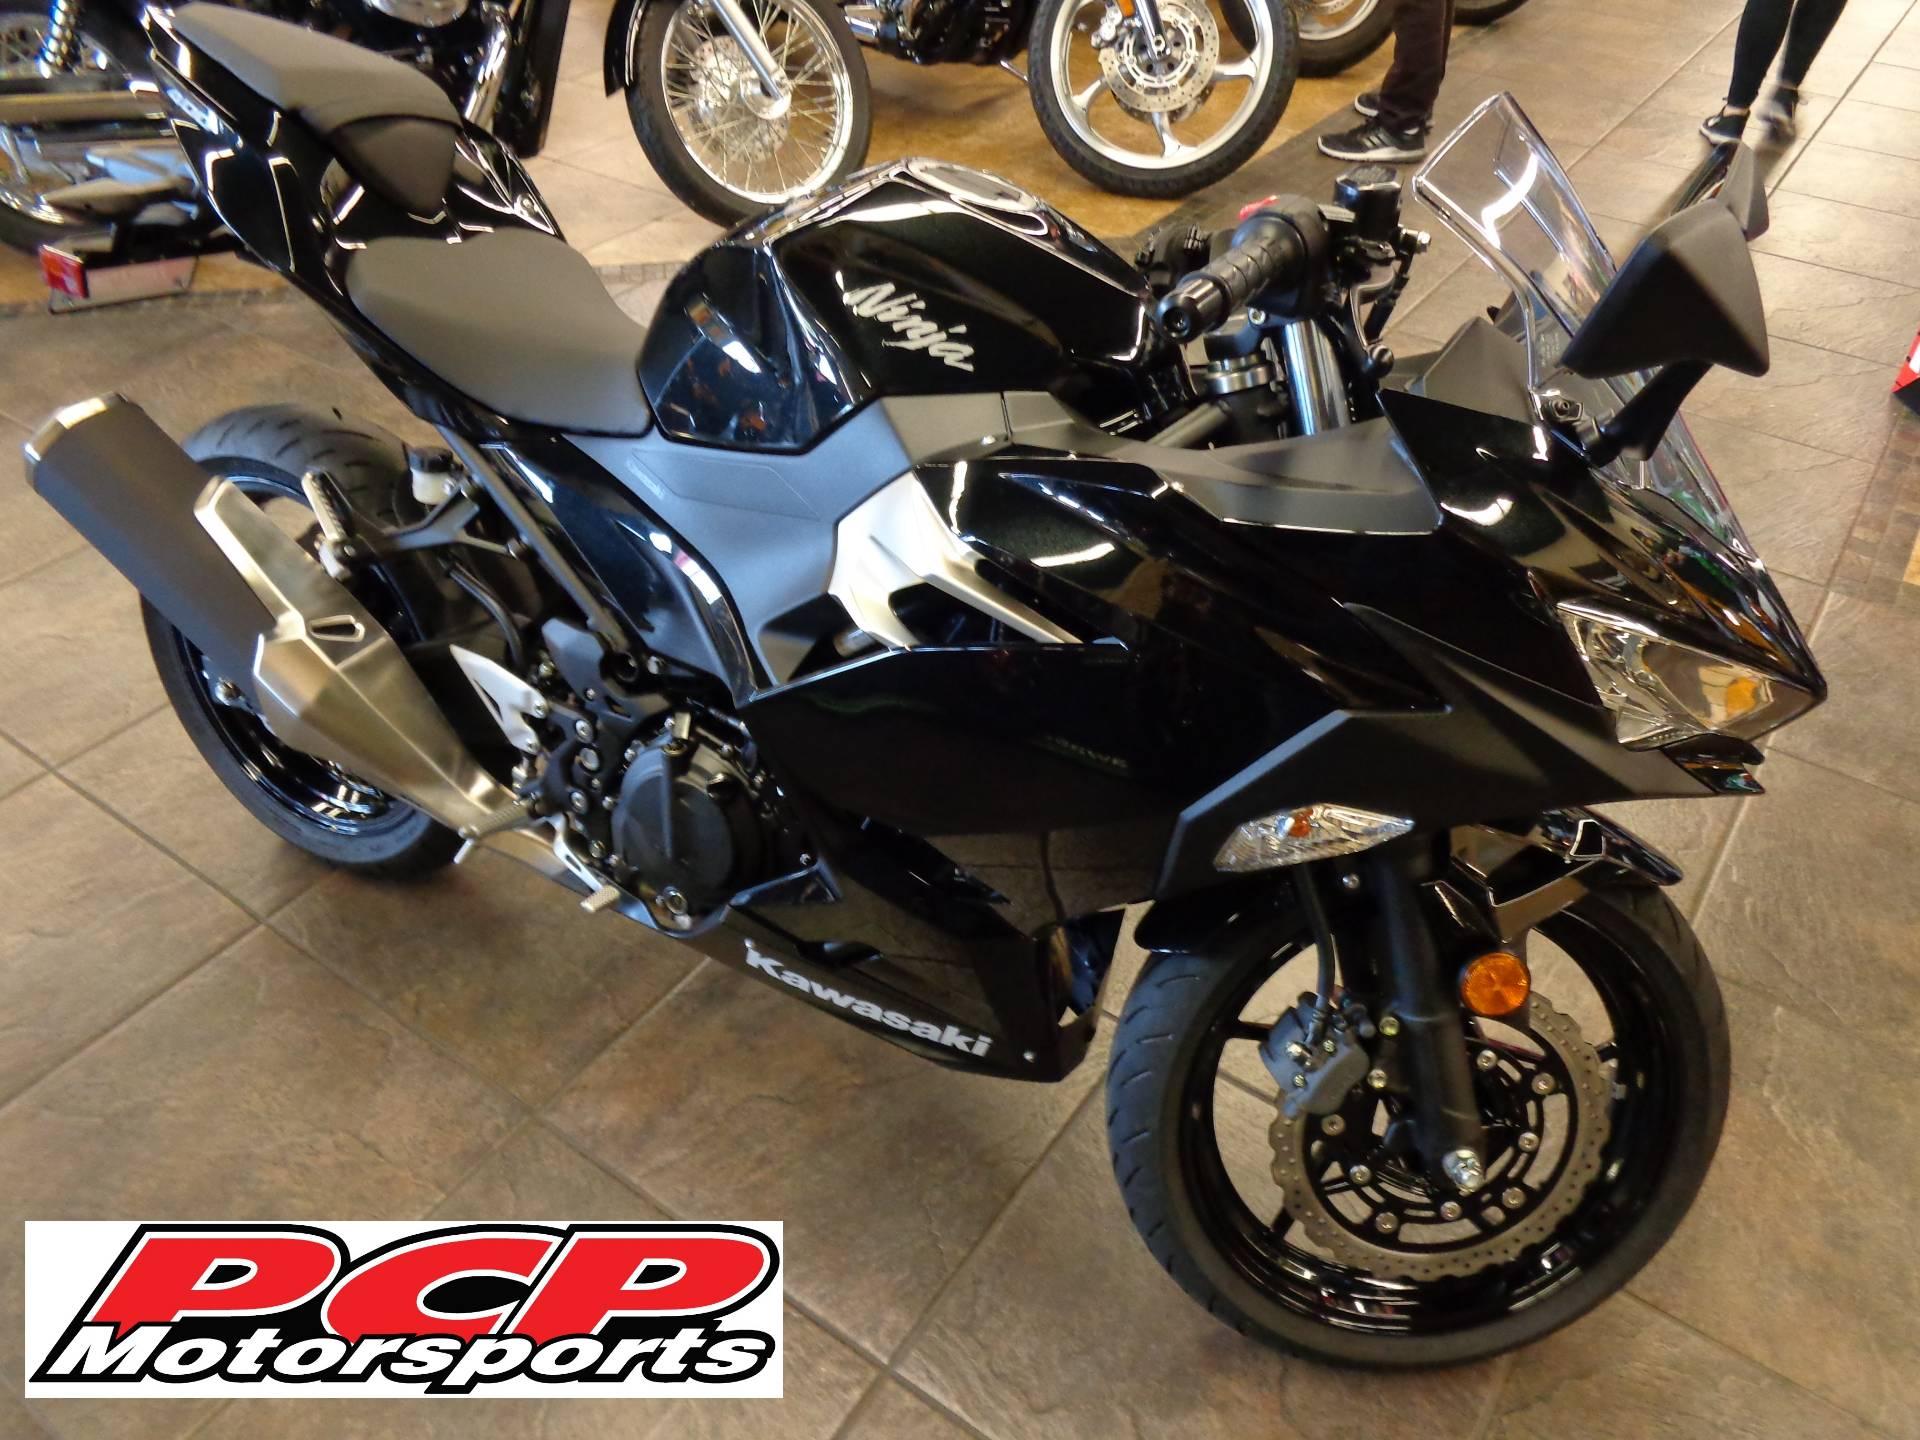 New 2018 Kawasaki Ninja 400 Motorcycles in Sacramento, CA | Stock ...